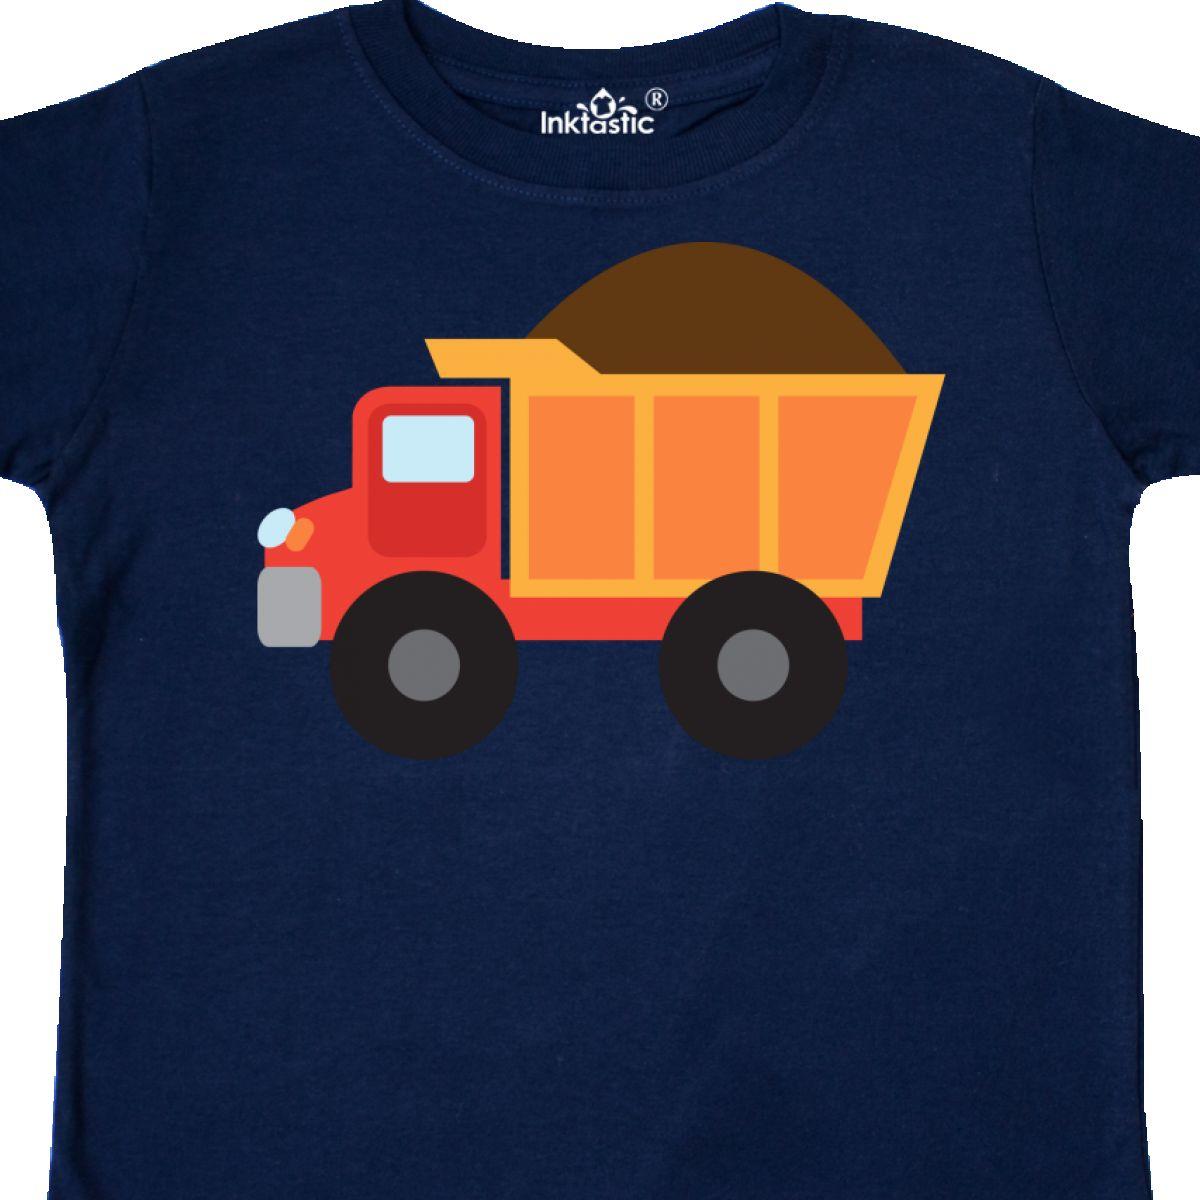 Inktastic-Work-Truck-Construction-Vehicle-Toddler-T-Shirt-Trucks-Vehicles-Cute thumbnail 22